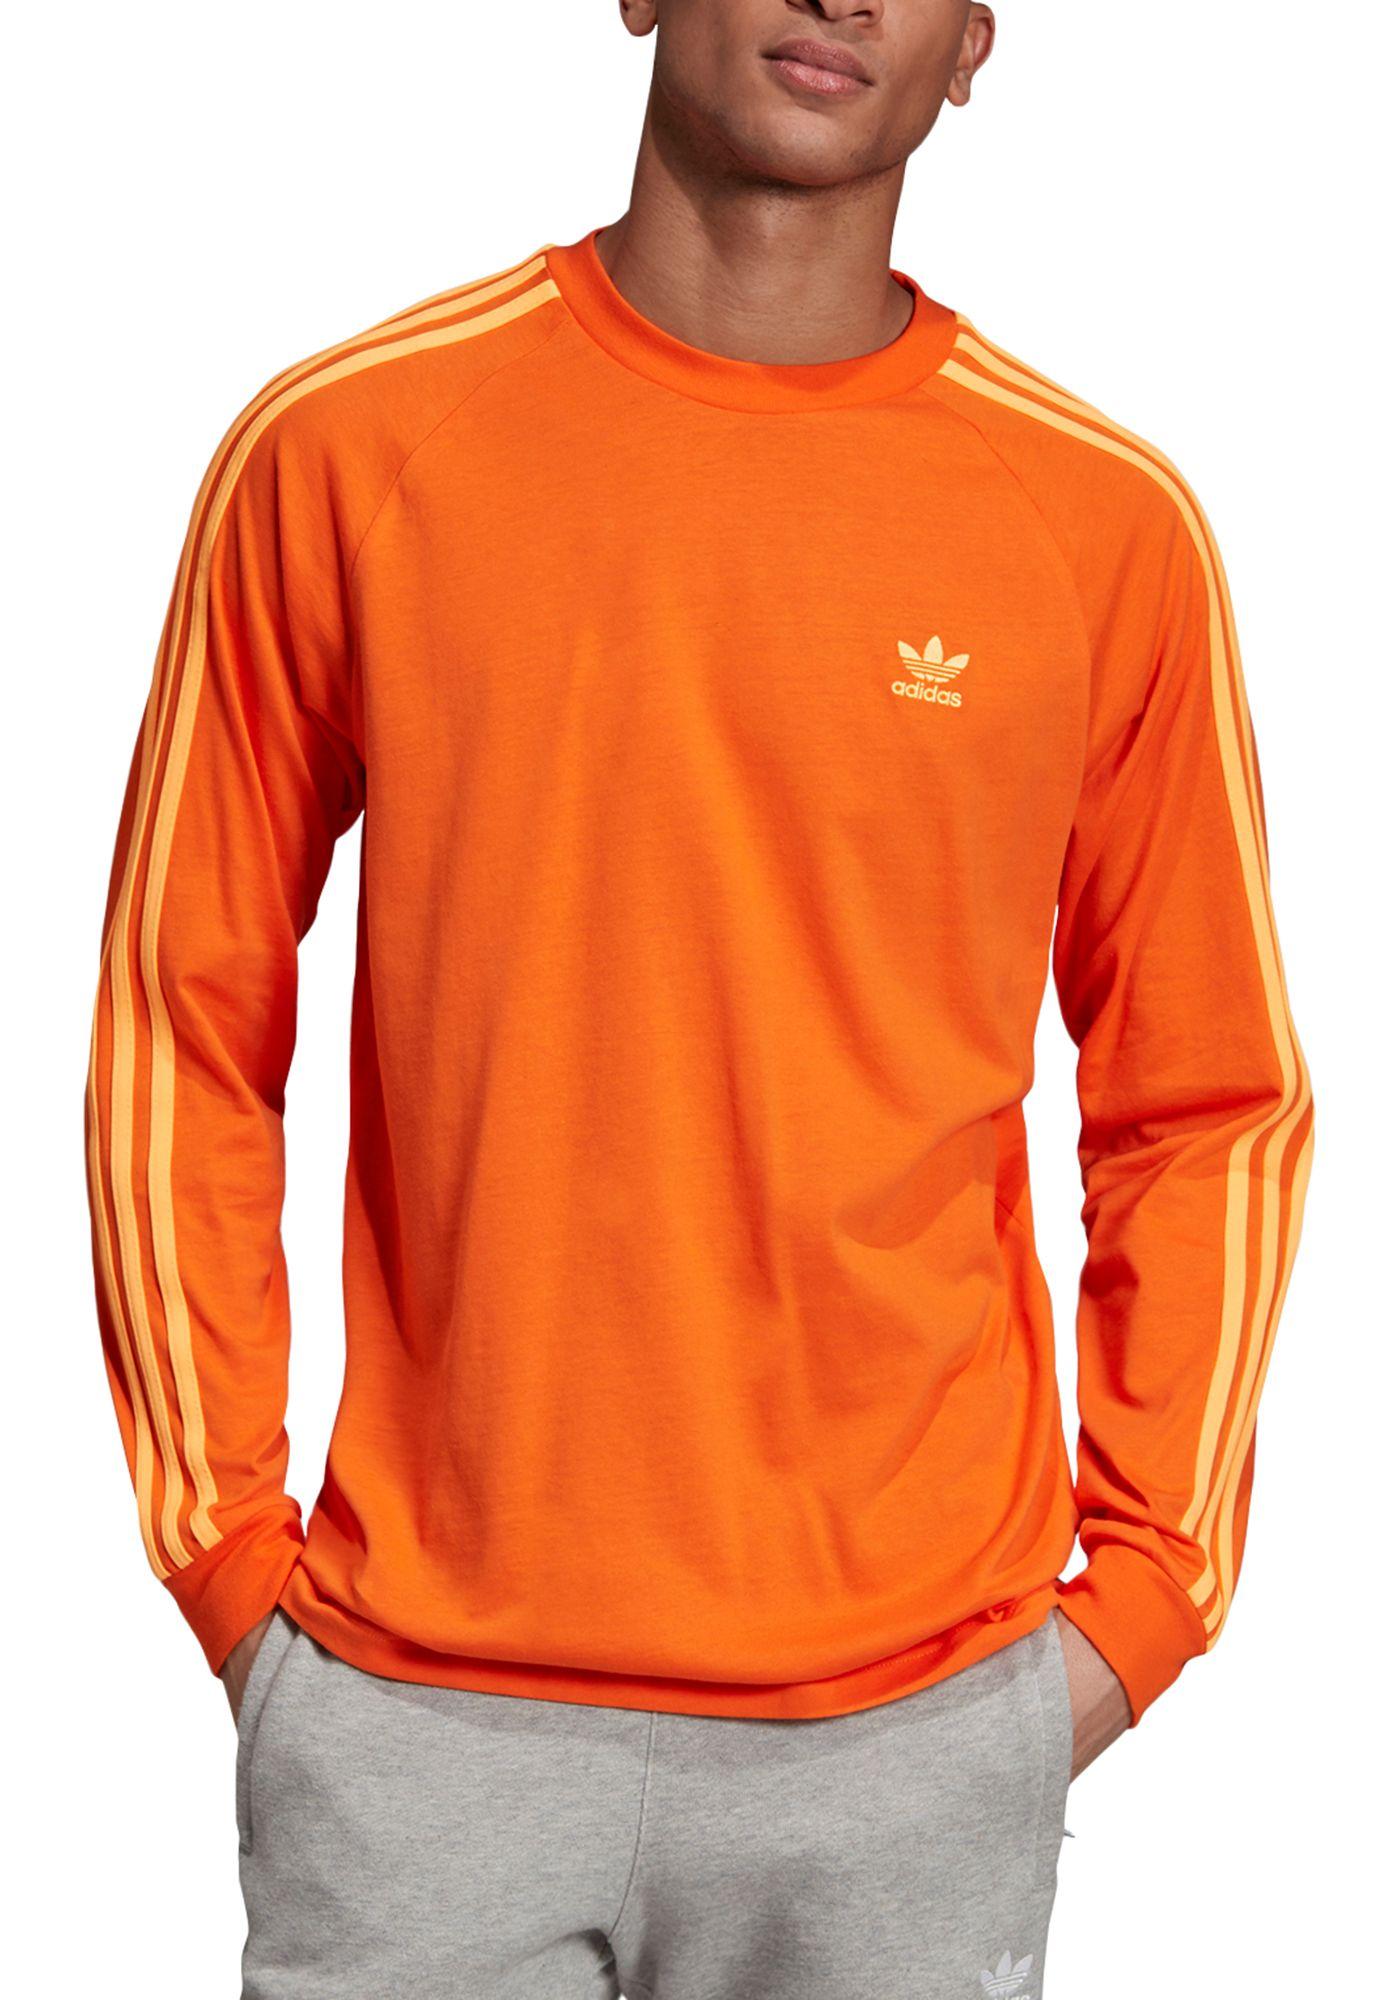 adidas Originals Men's 3-Stripes Long Sleeve Shirt